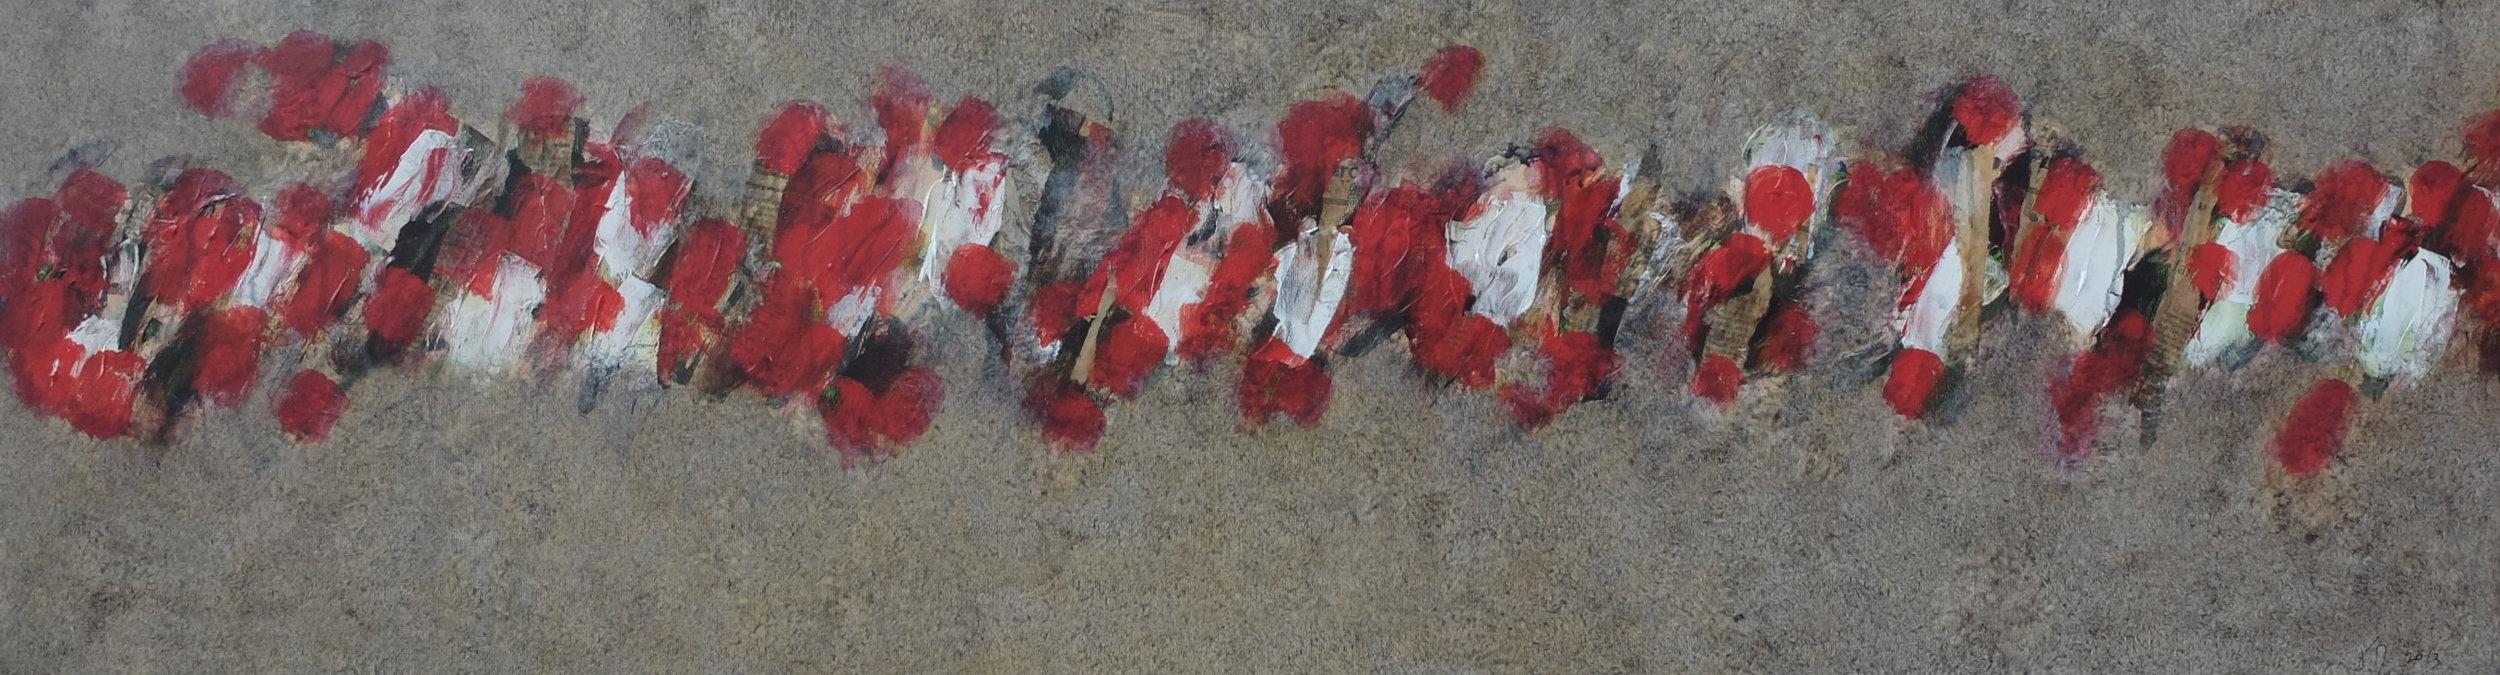 walk; 35x130; mixed media on canvas; 2014